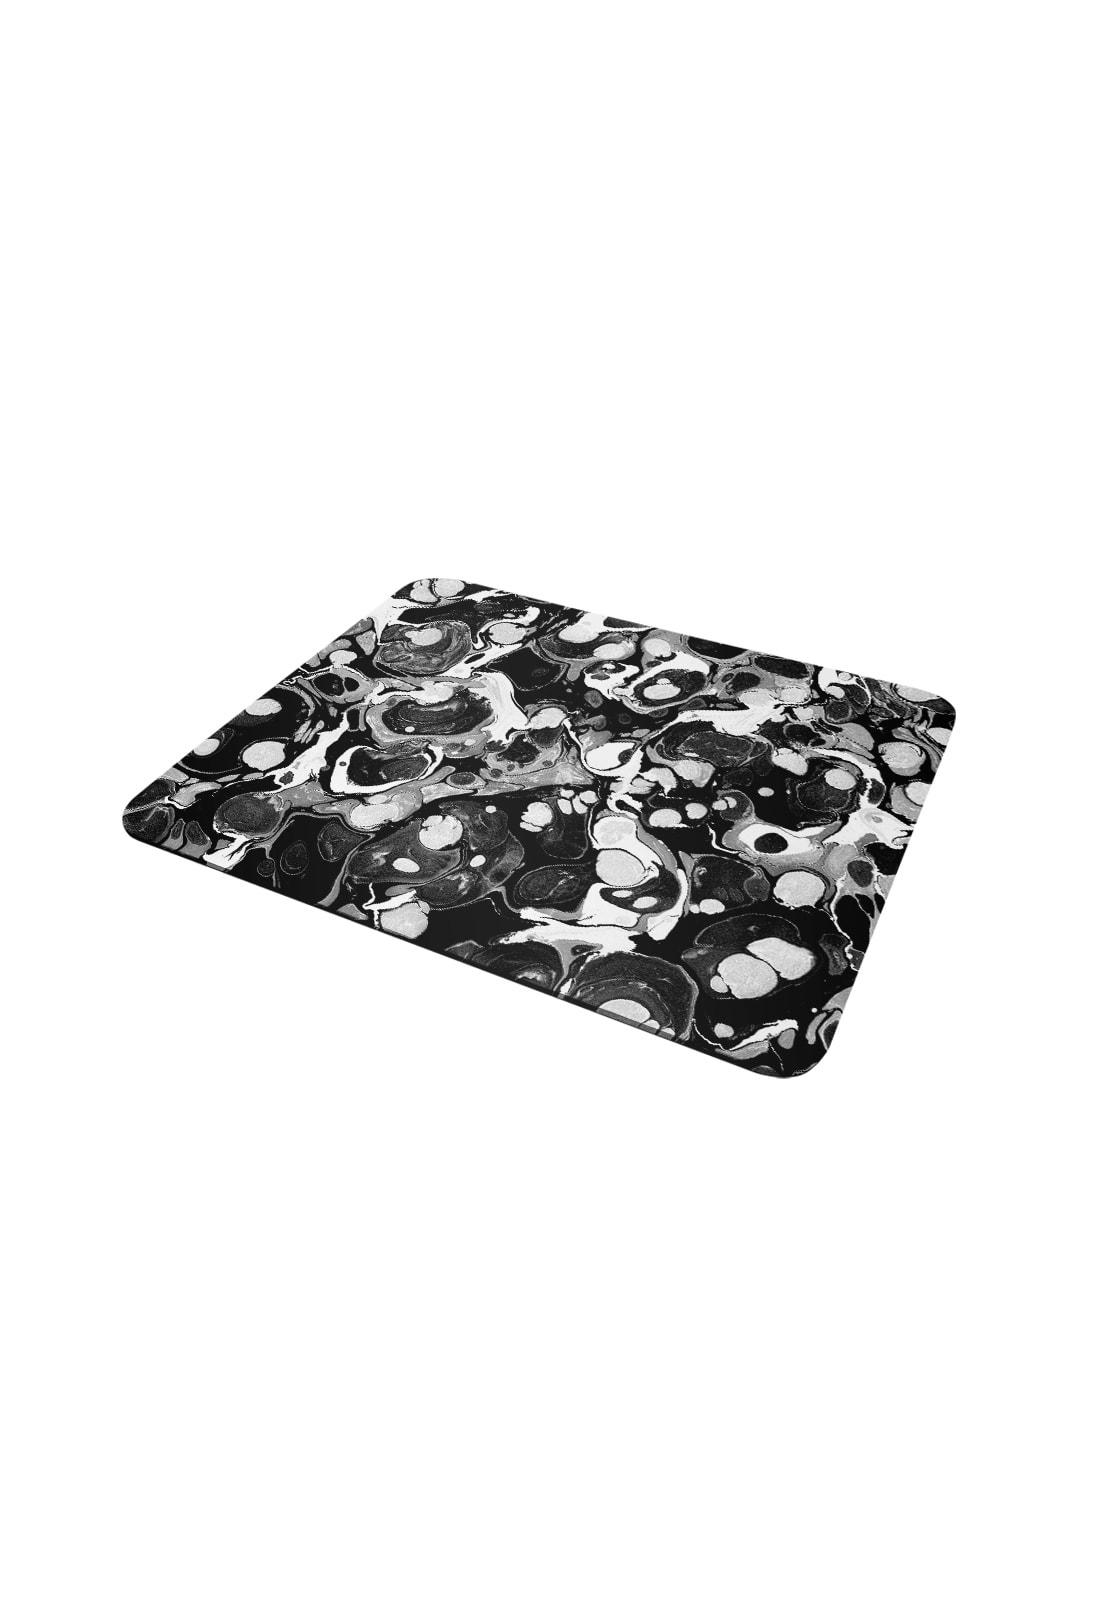 Mousepad Marmolado Negro WARA